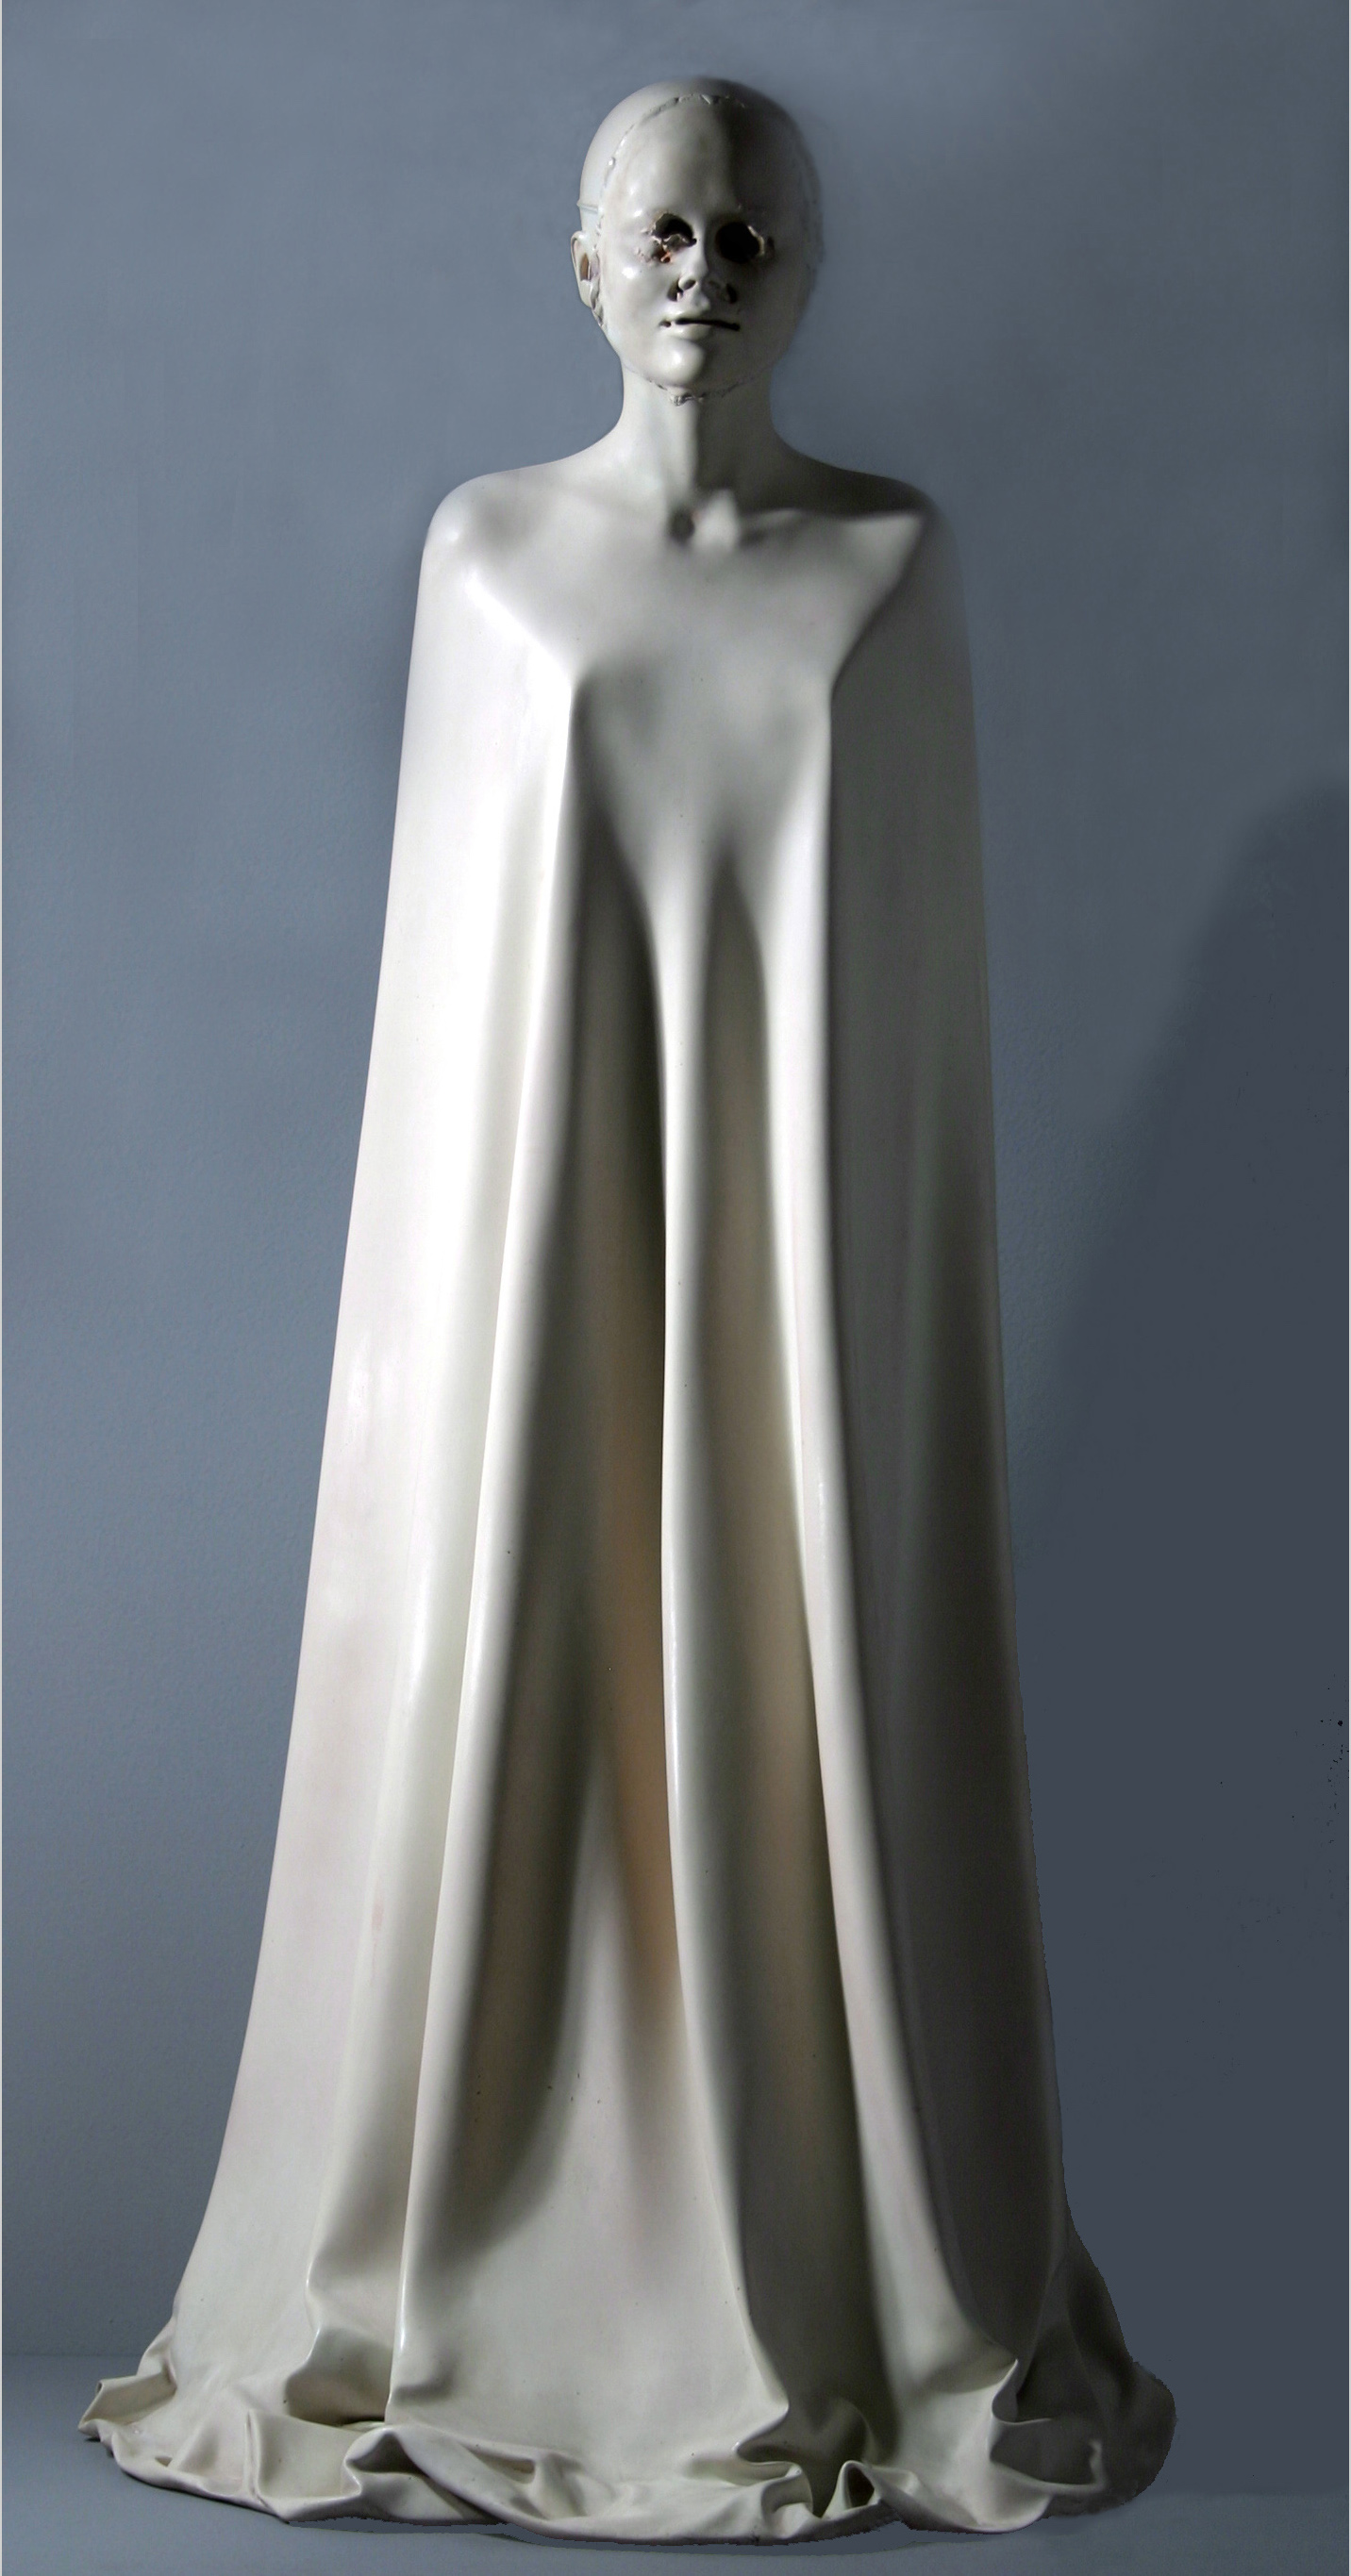 Arthur Kern: Persona, 63 inches tall, 1974